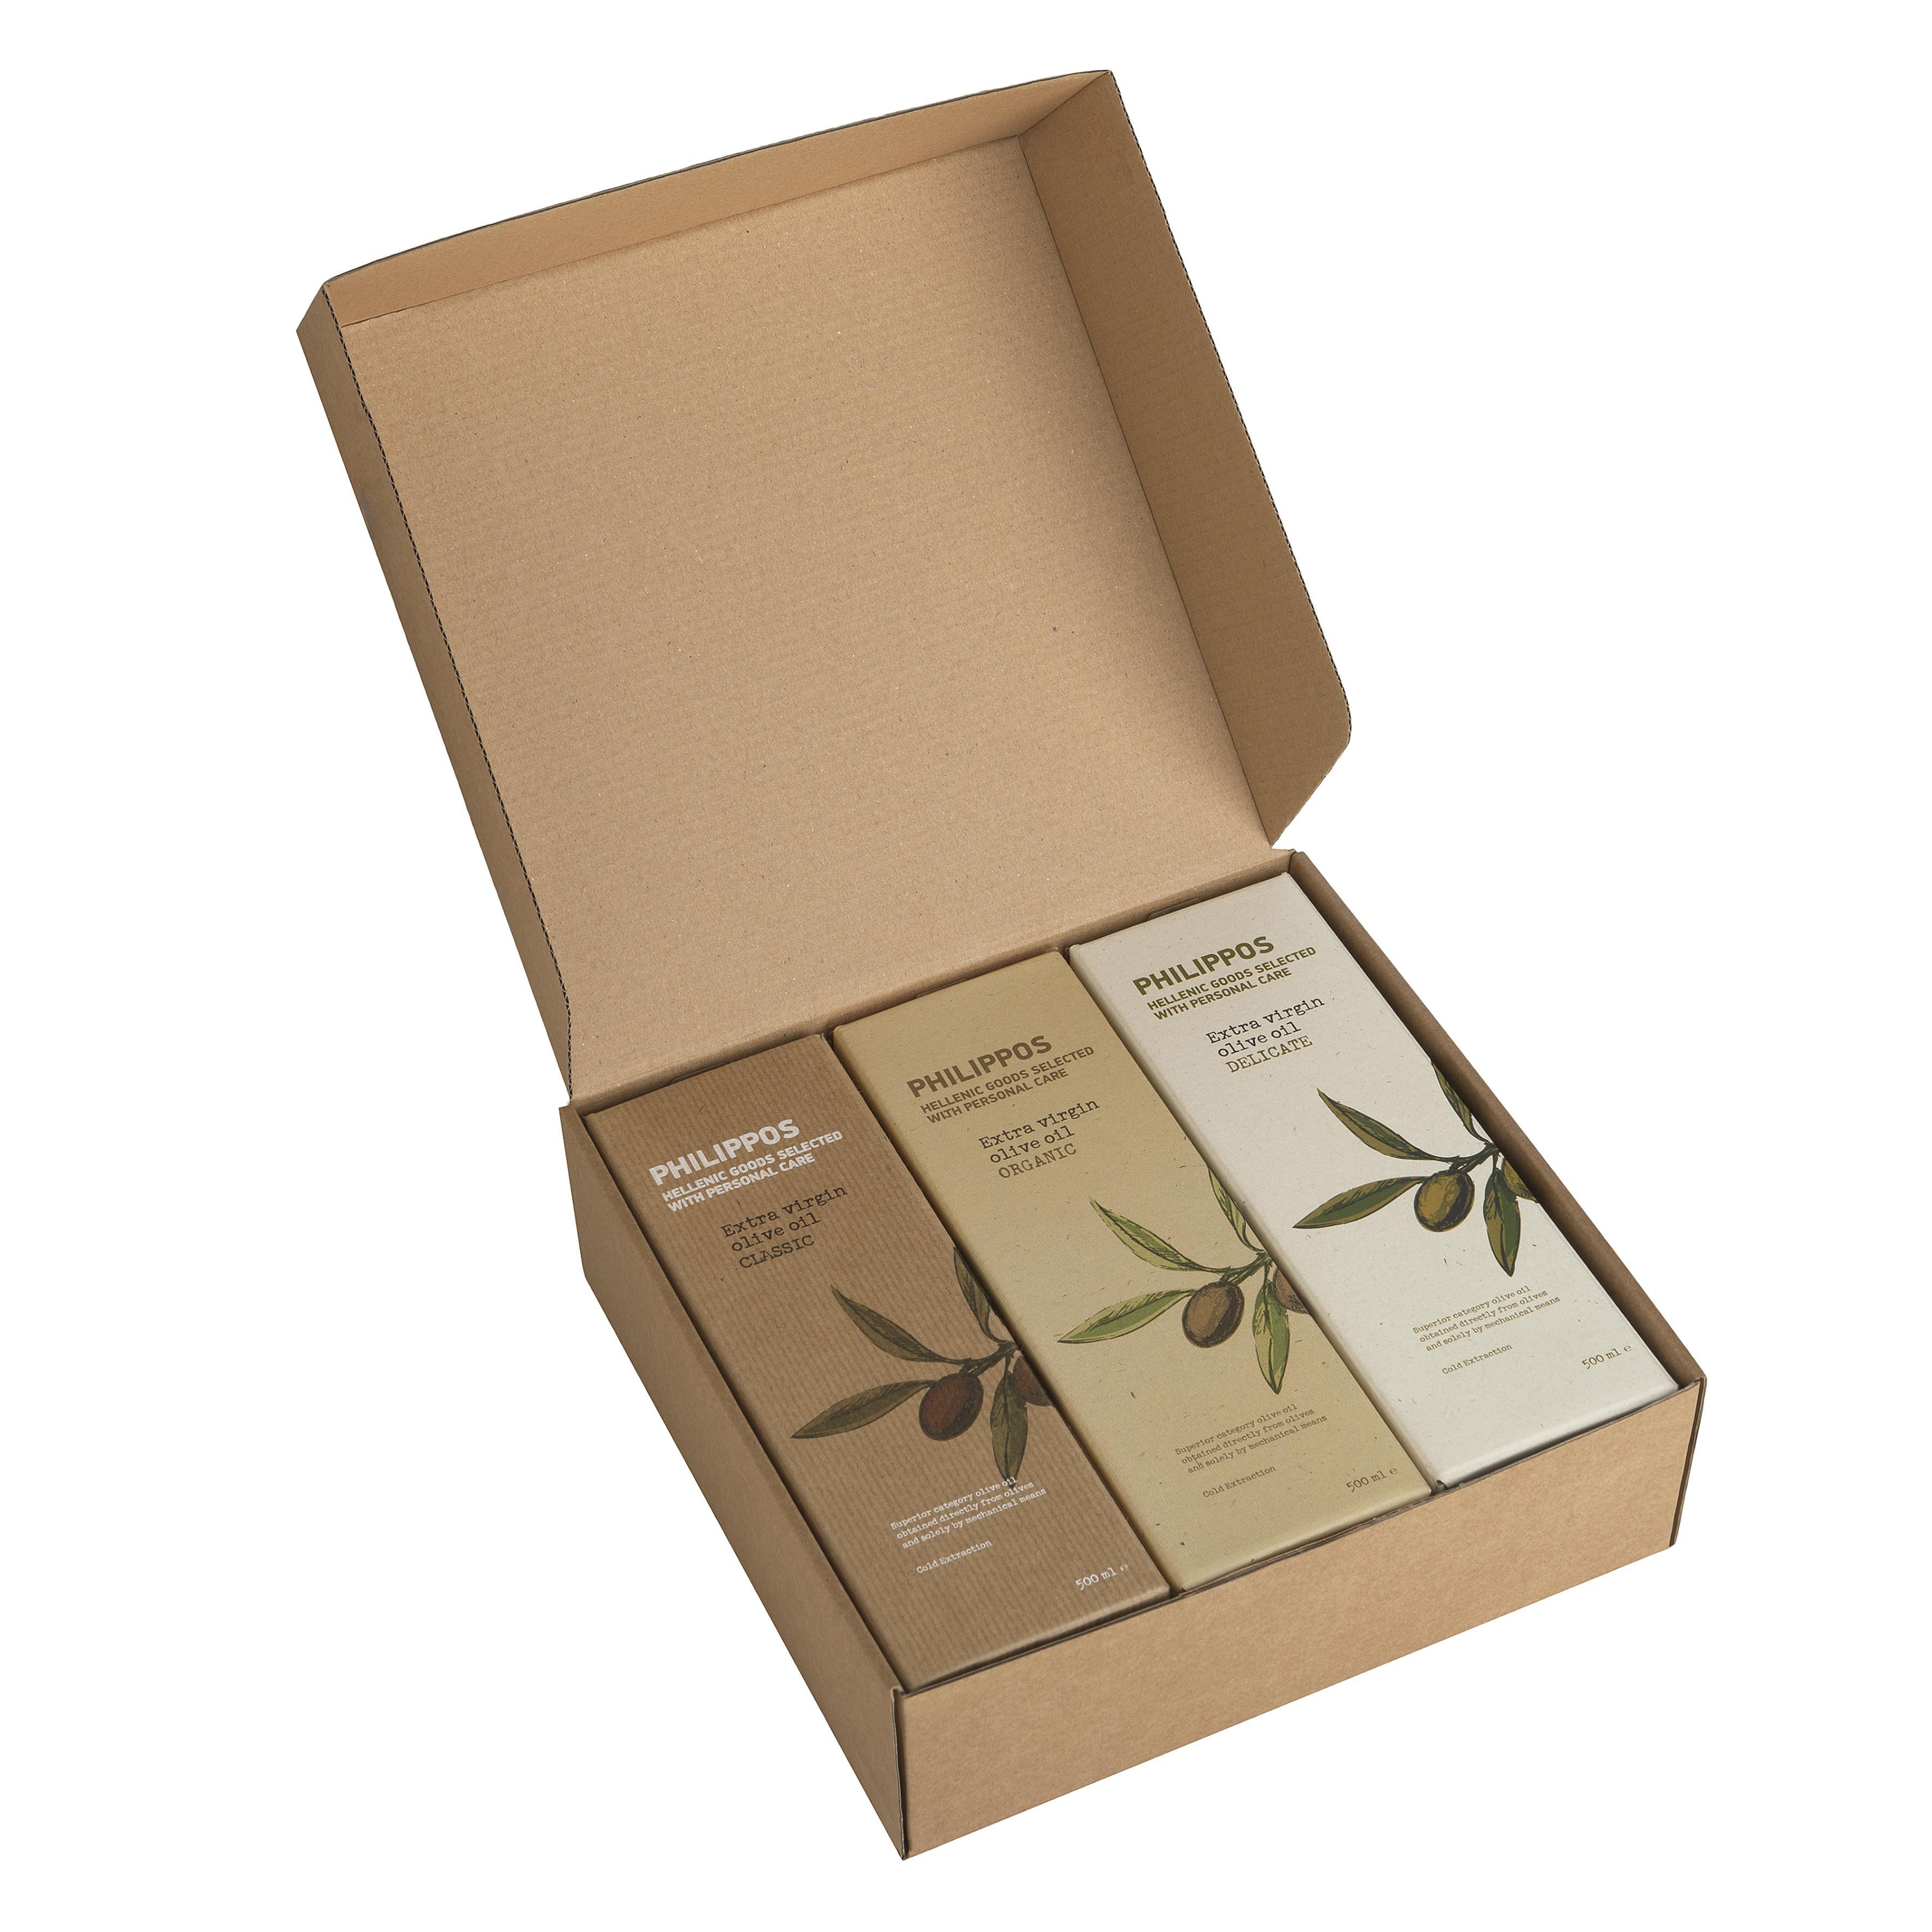 PHILIPPOS Gift Box trio